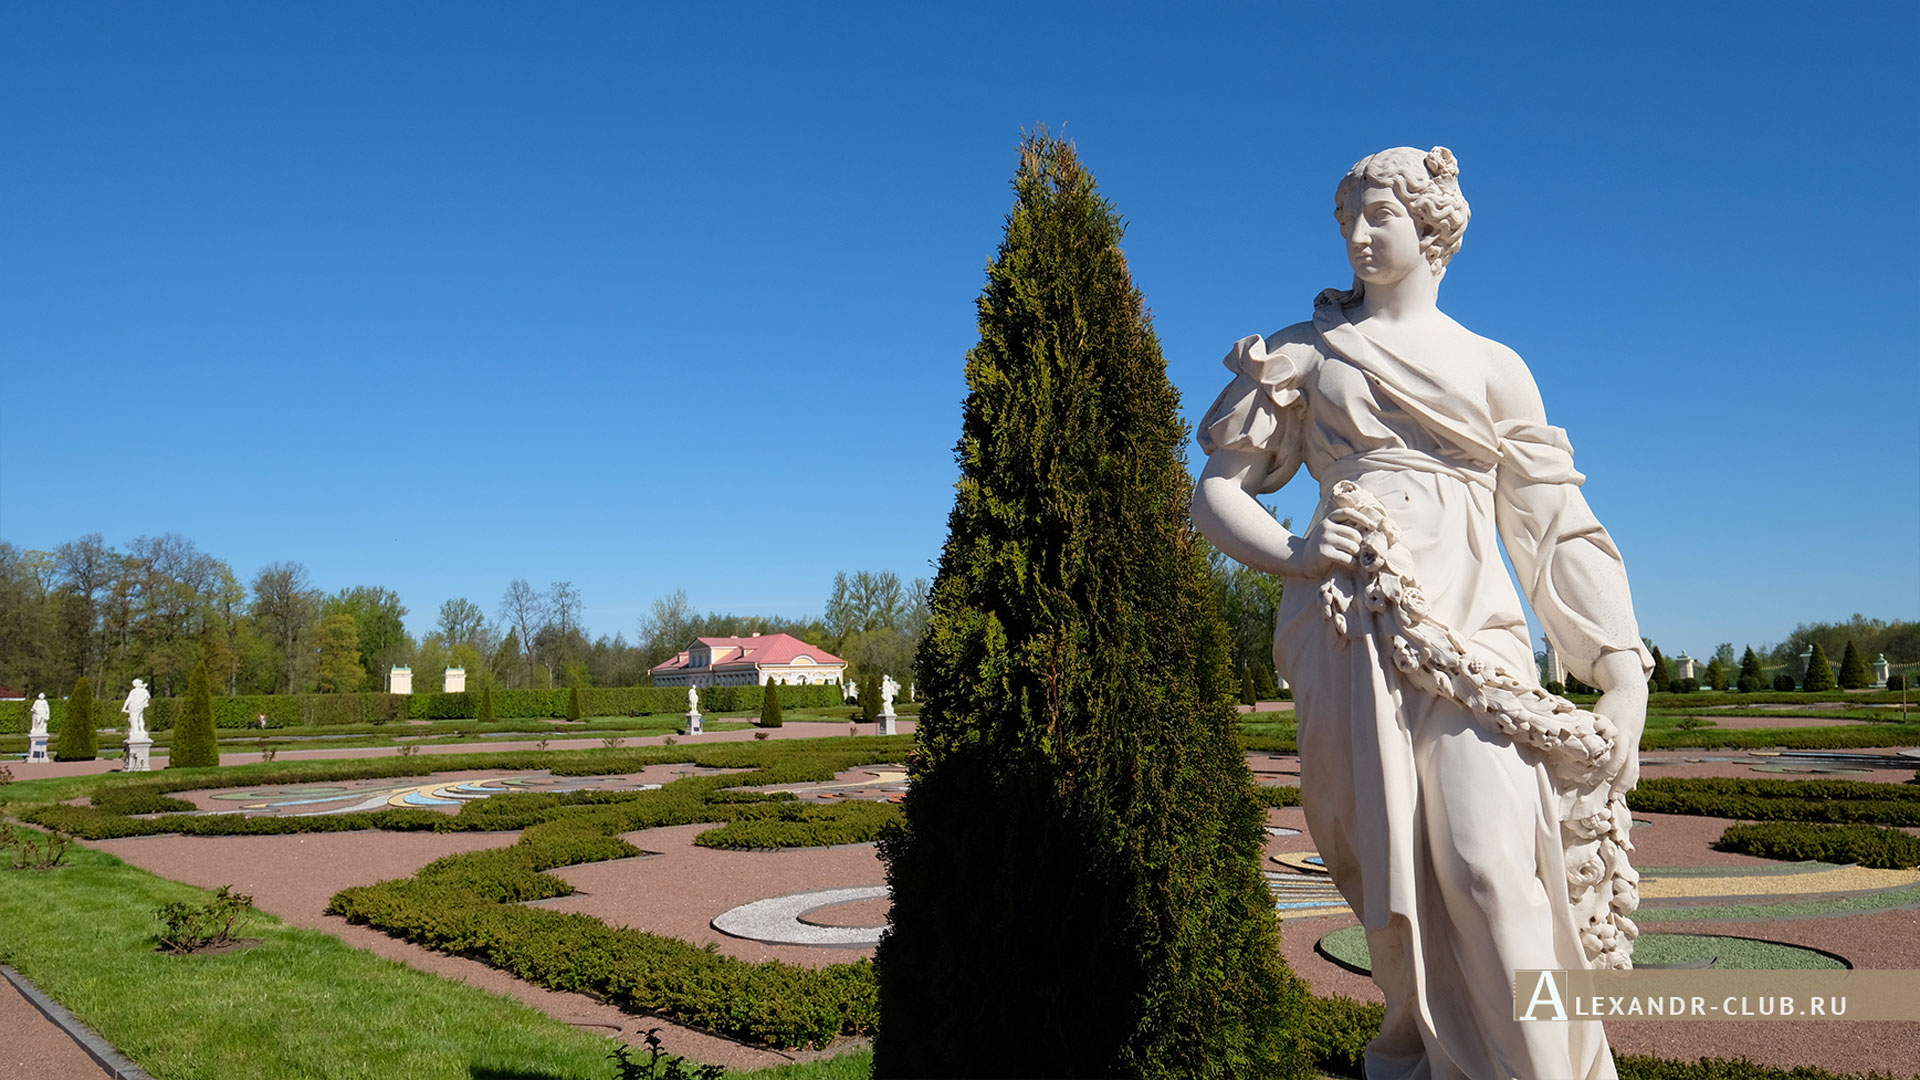 Ораниенбаум, весна, Большой Меншиковский дворец, Нижний сад